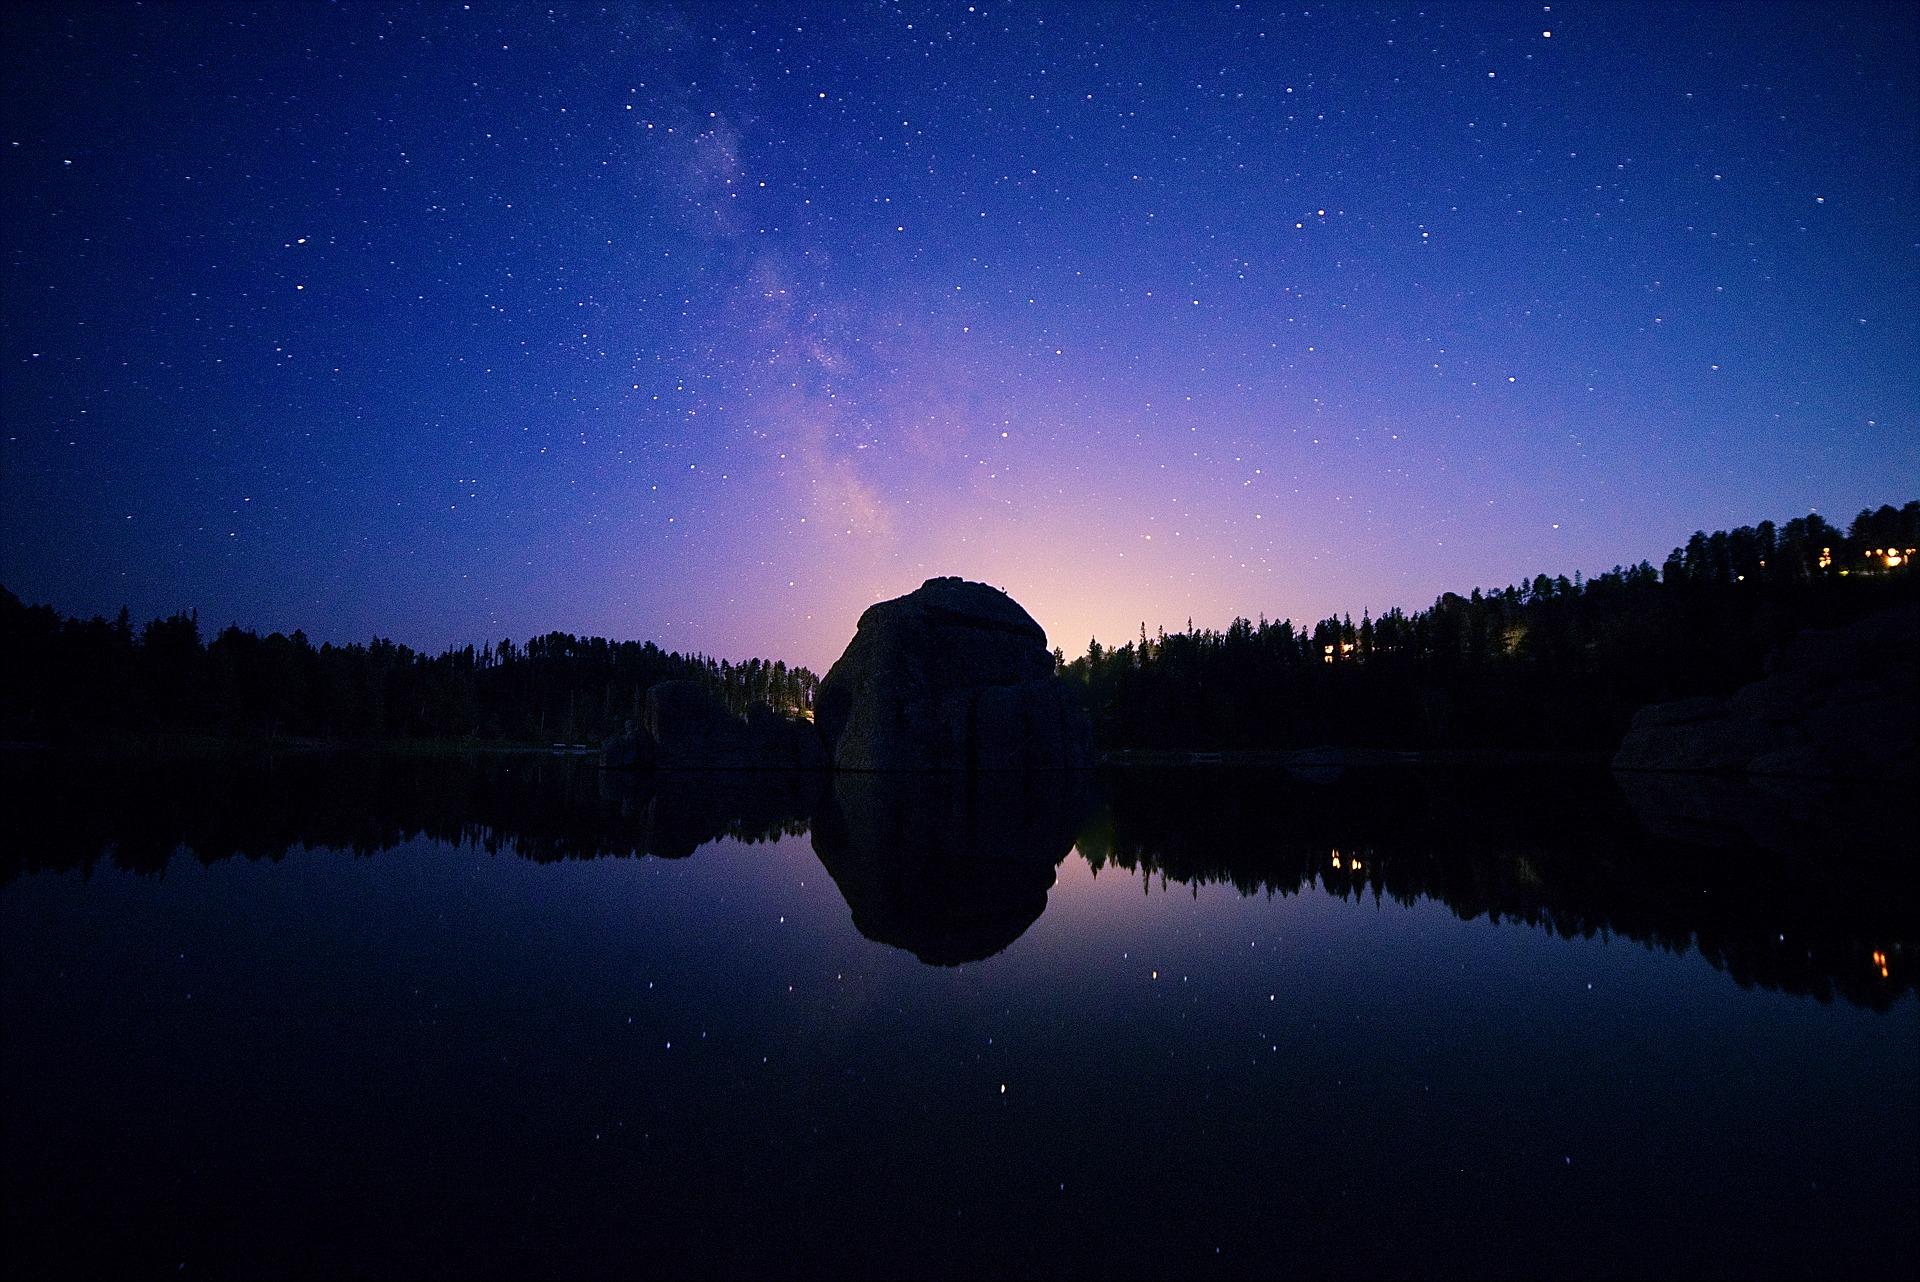 sylvan-lake-South Dakota-summer-vacation-ideas-alignthoughts